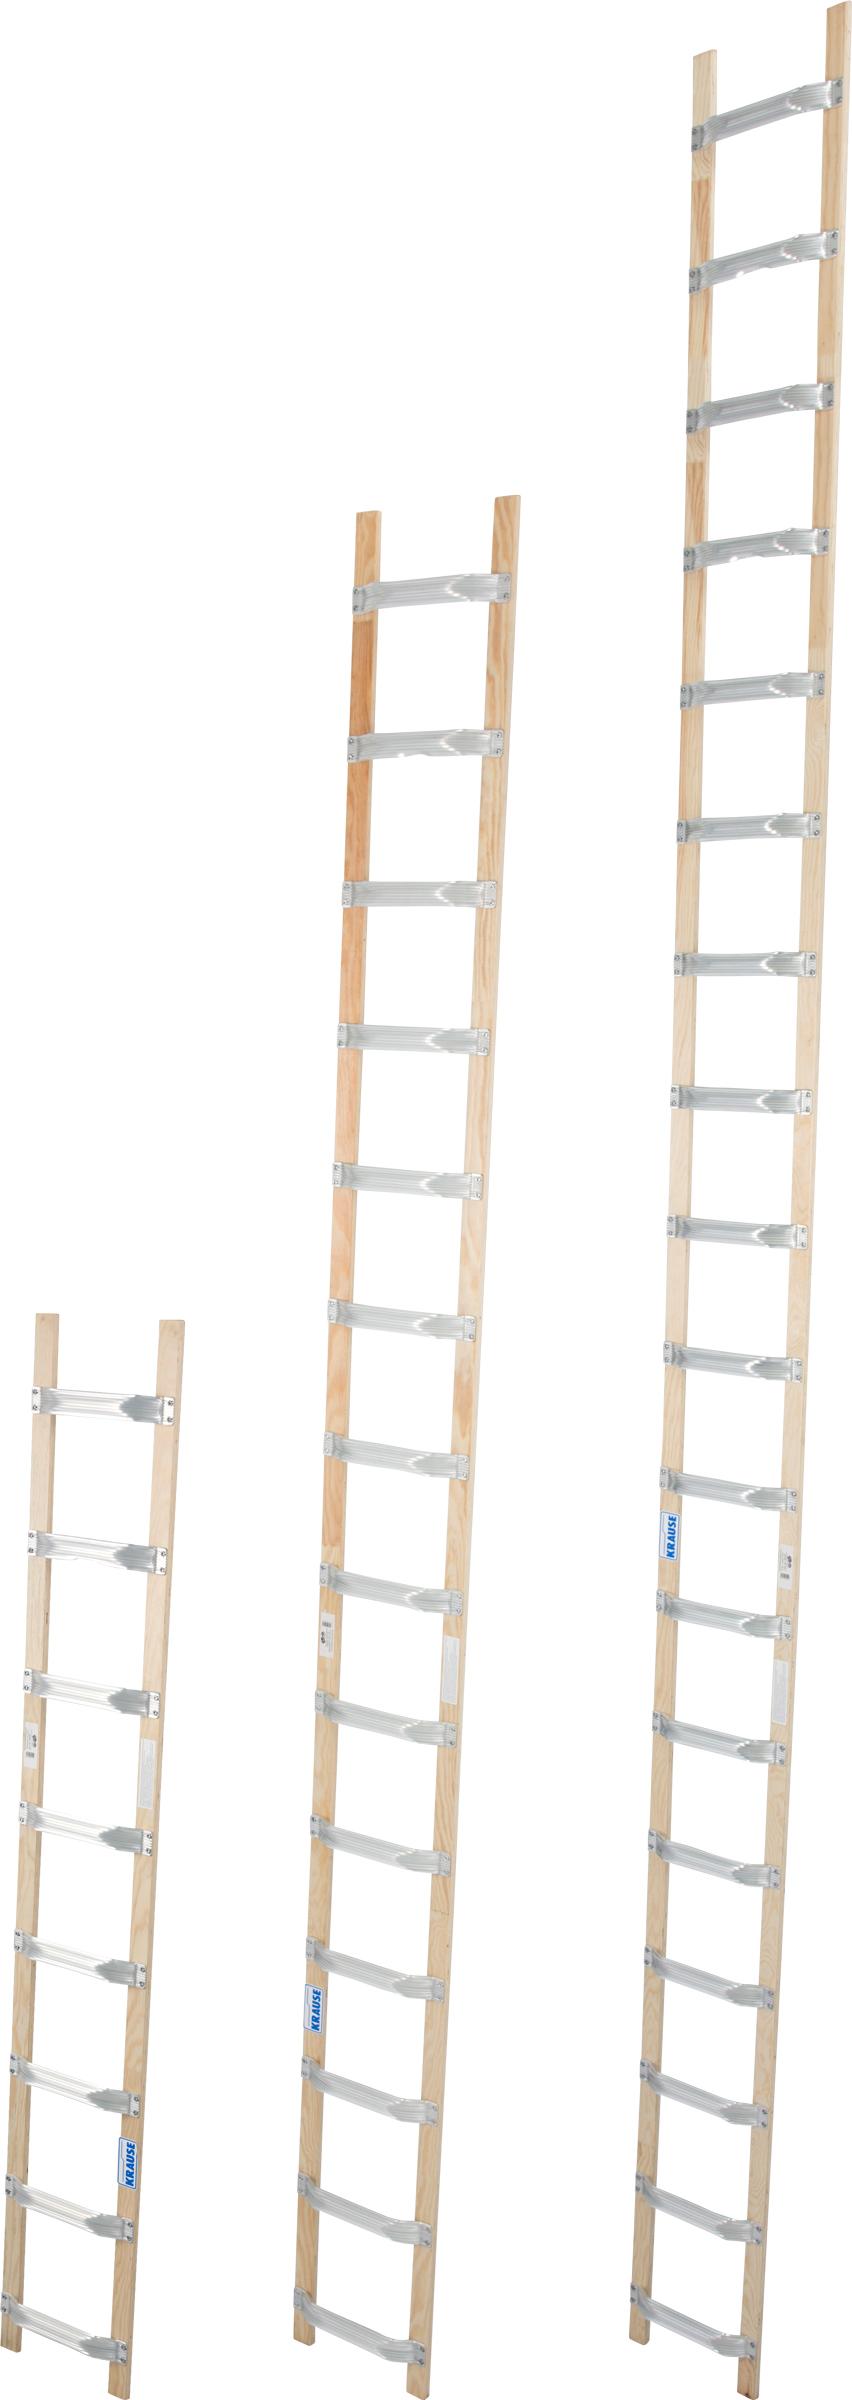 Krause Alu-Holz-Dachleiter